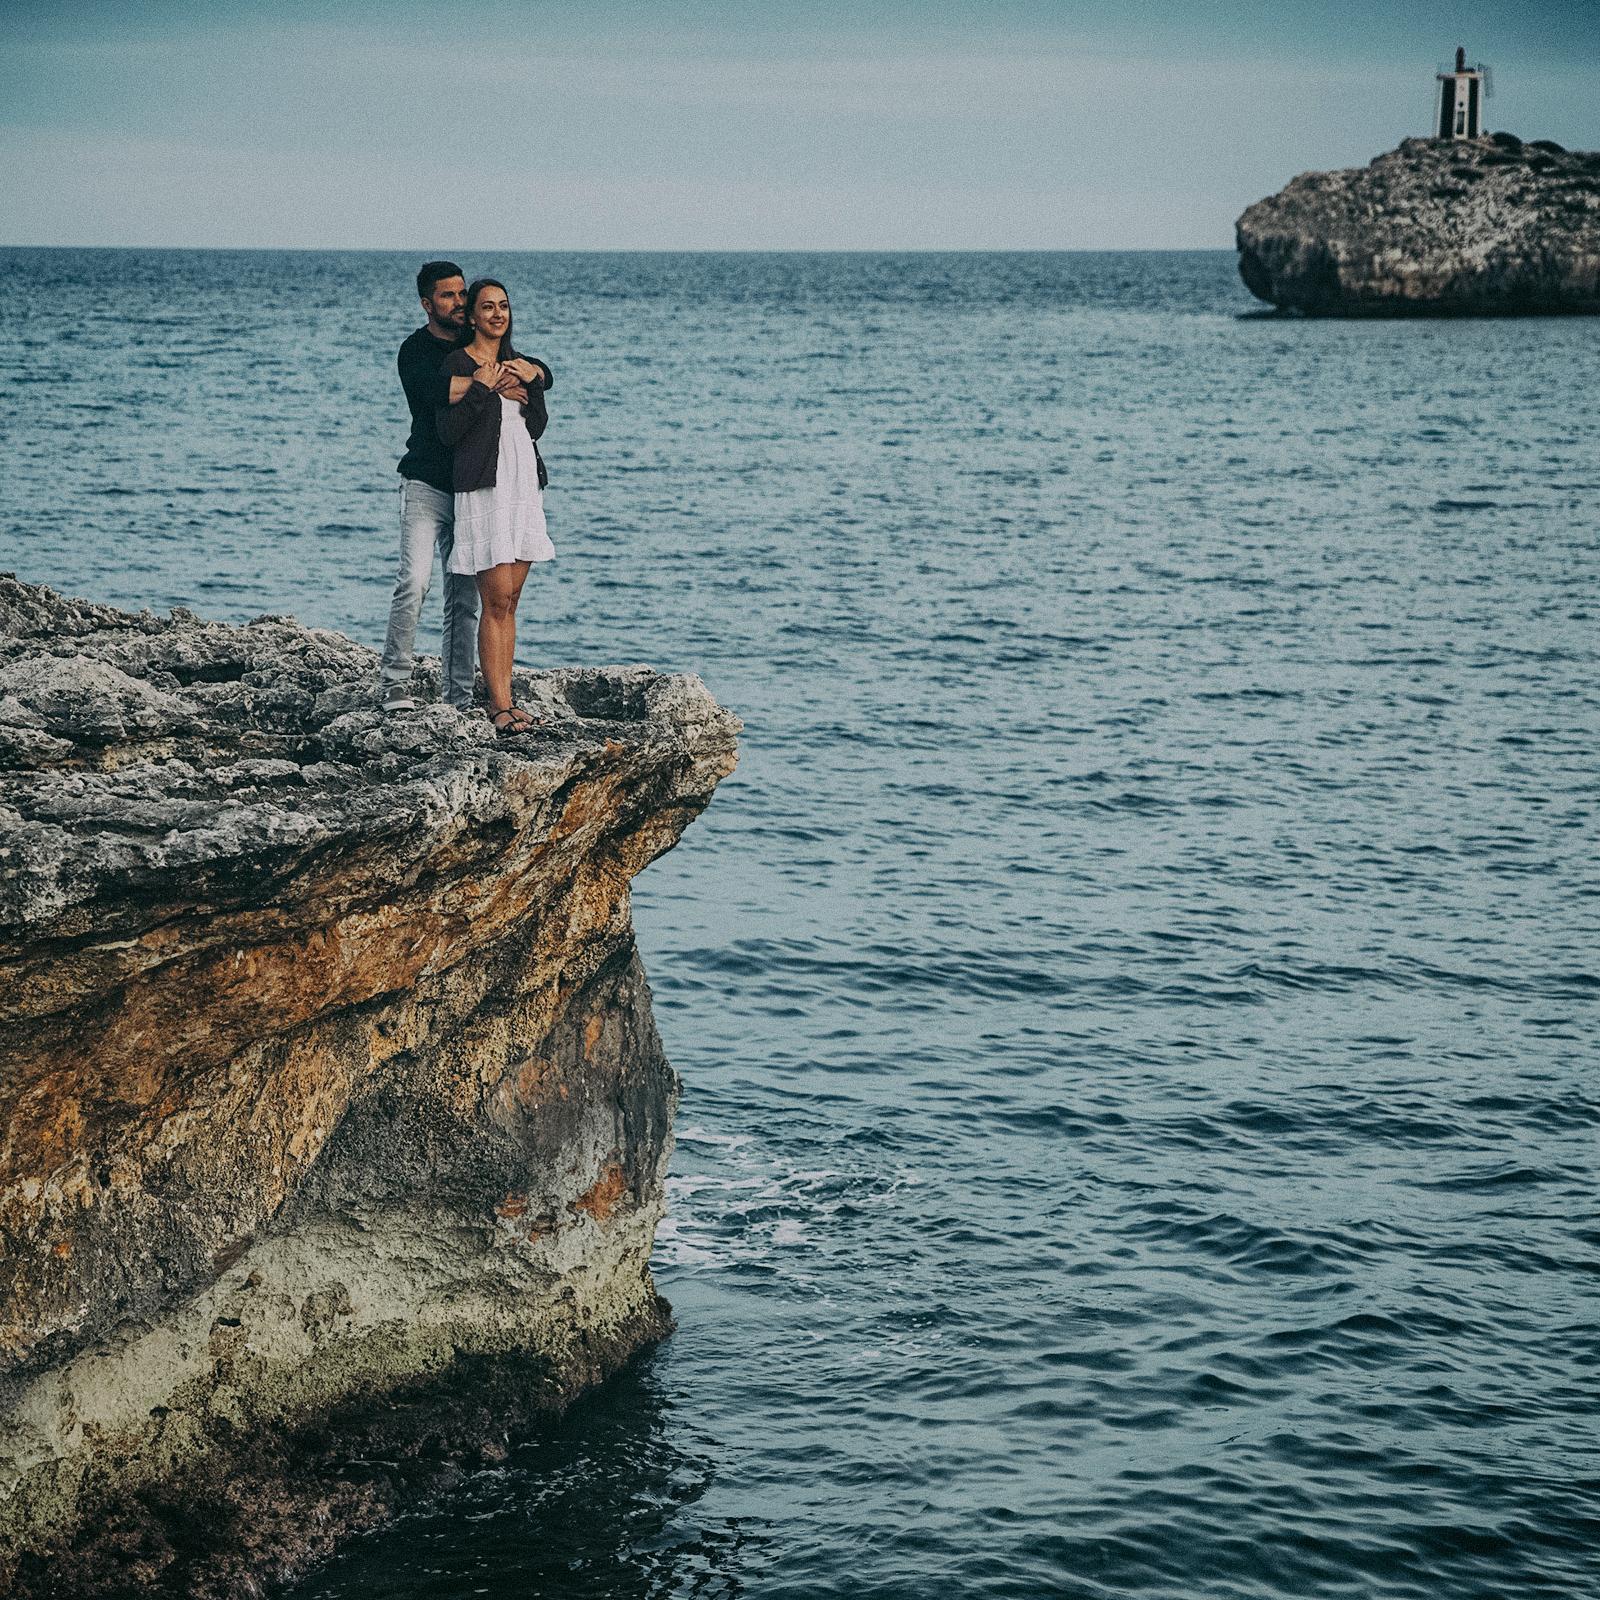 Fotoshooting_Mallorca_Lovestories_G8_q